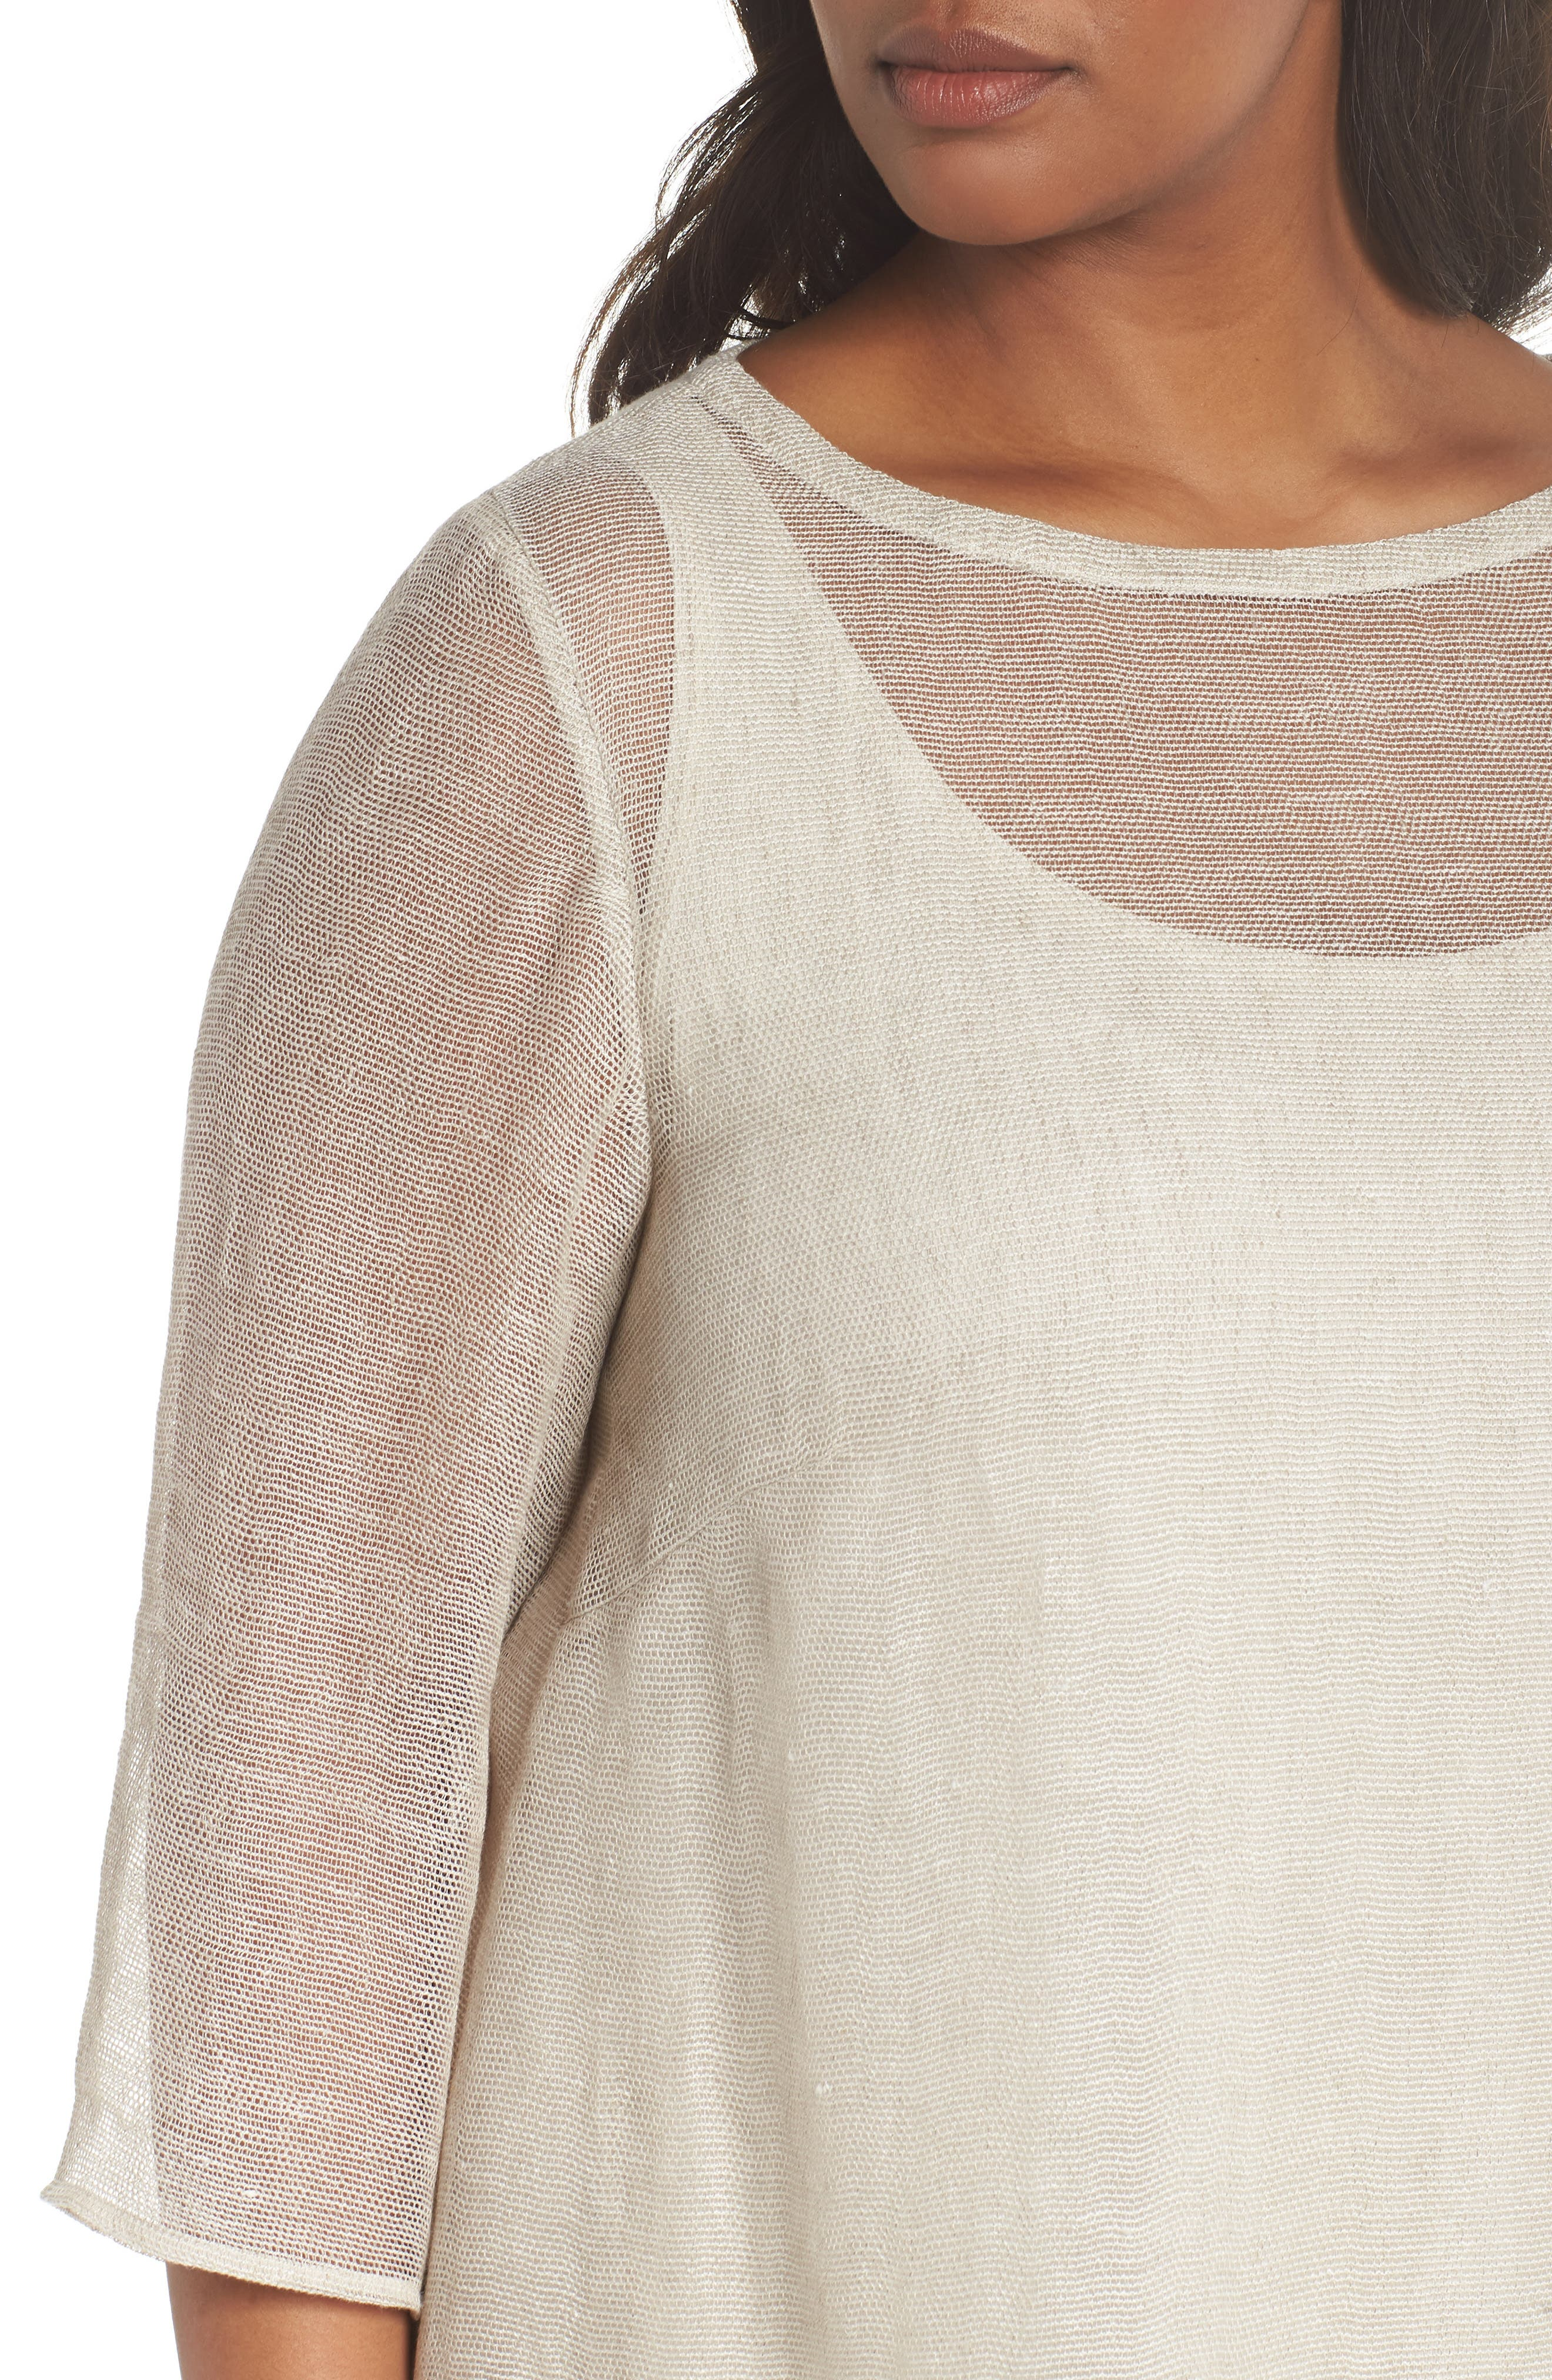 Organic Linen Mesh Tunic,                             Alternate thumbnail 4, color,                             Undyed Natural